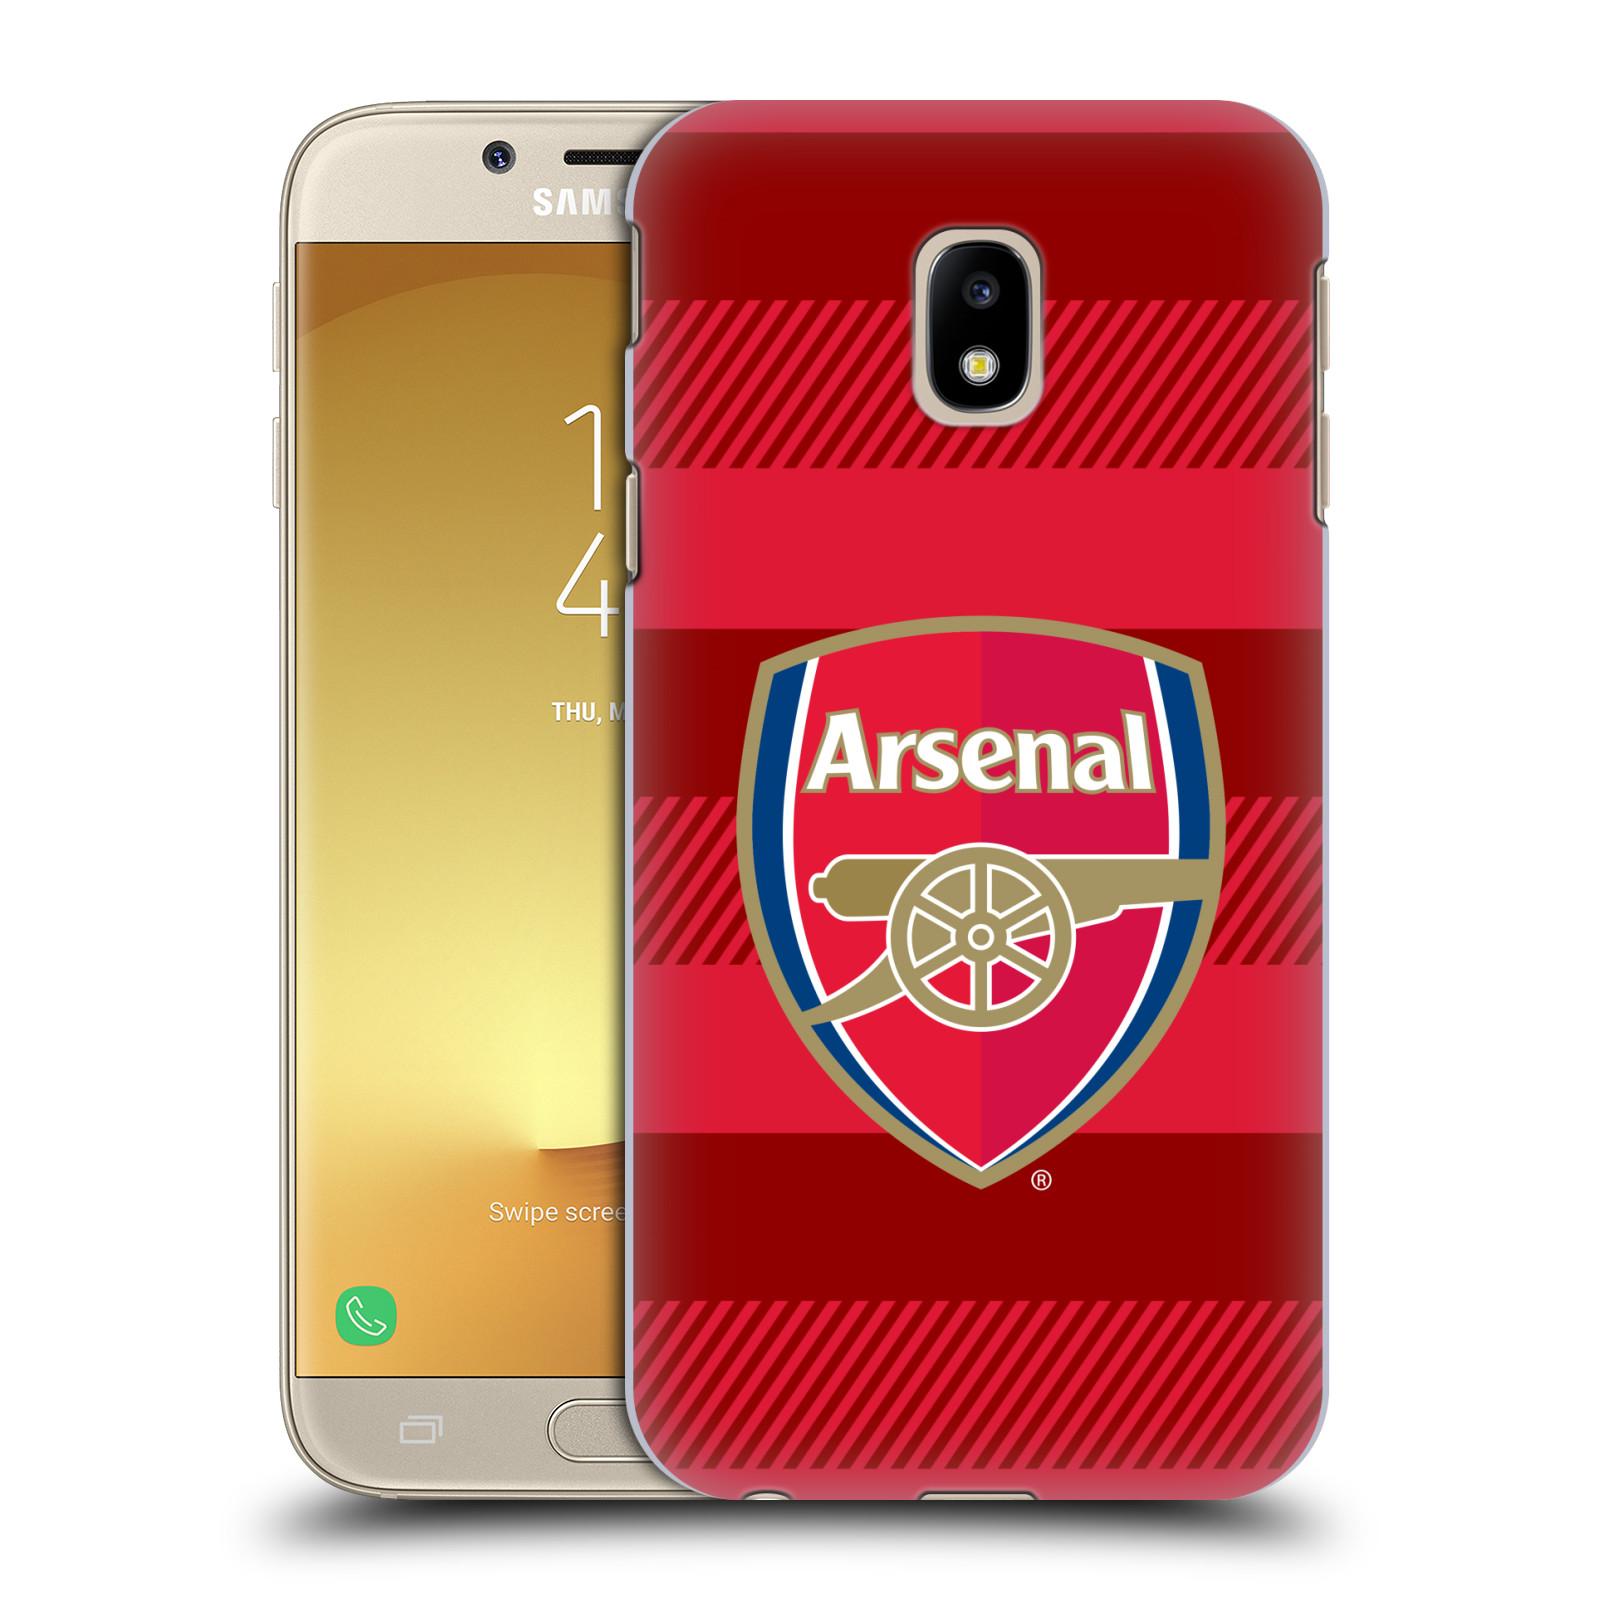 Plastové pouzdro na mobil Samsung Galaxy J3 (2017) - Head Case - Arsenal FC - Logo s pruhy